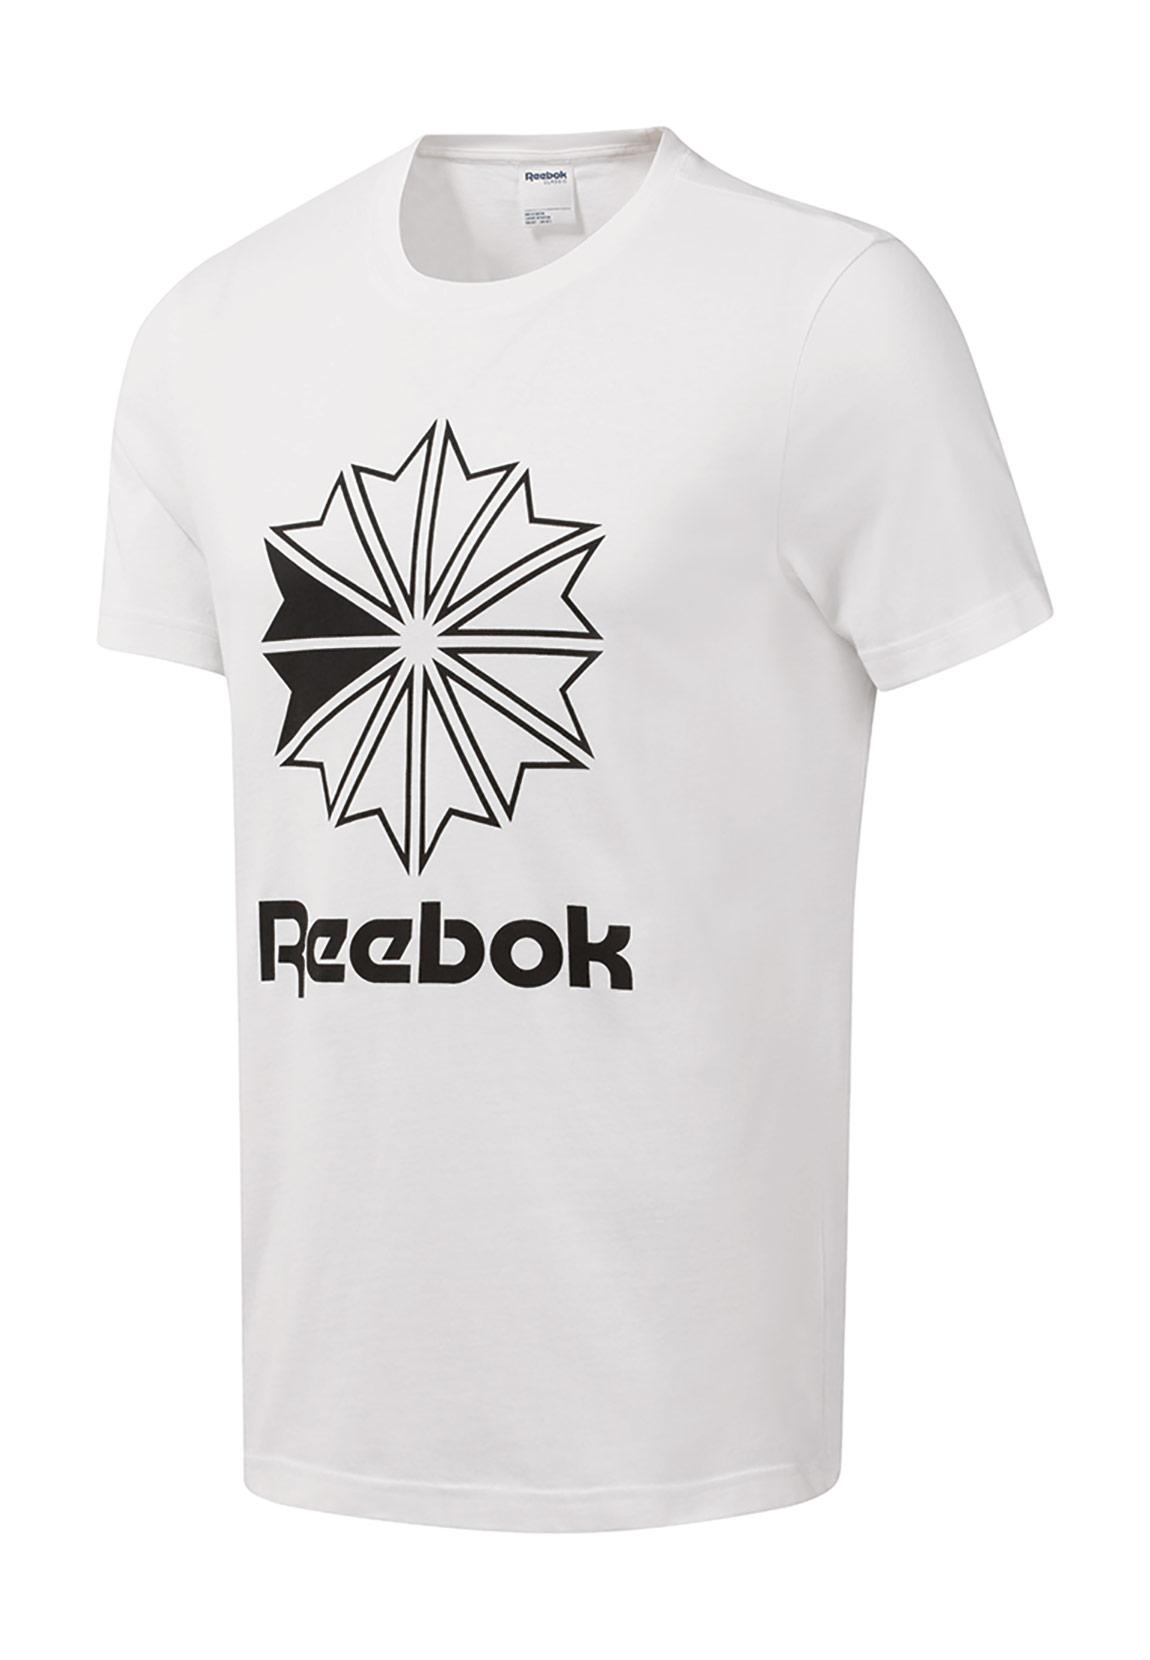 the best attitude ef186 7fbf0 Reebok T-Shirt Herren CL BIG LOGO TEE DT8117 Weiss